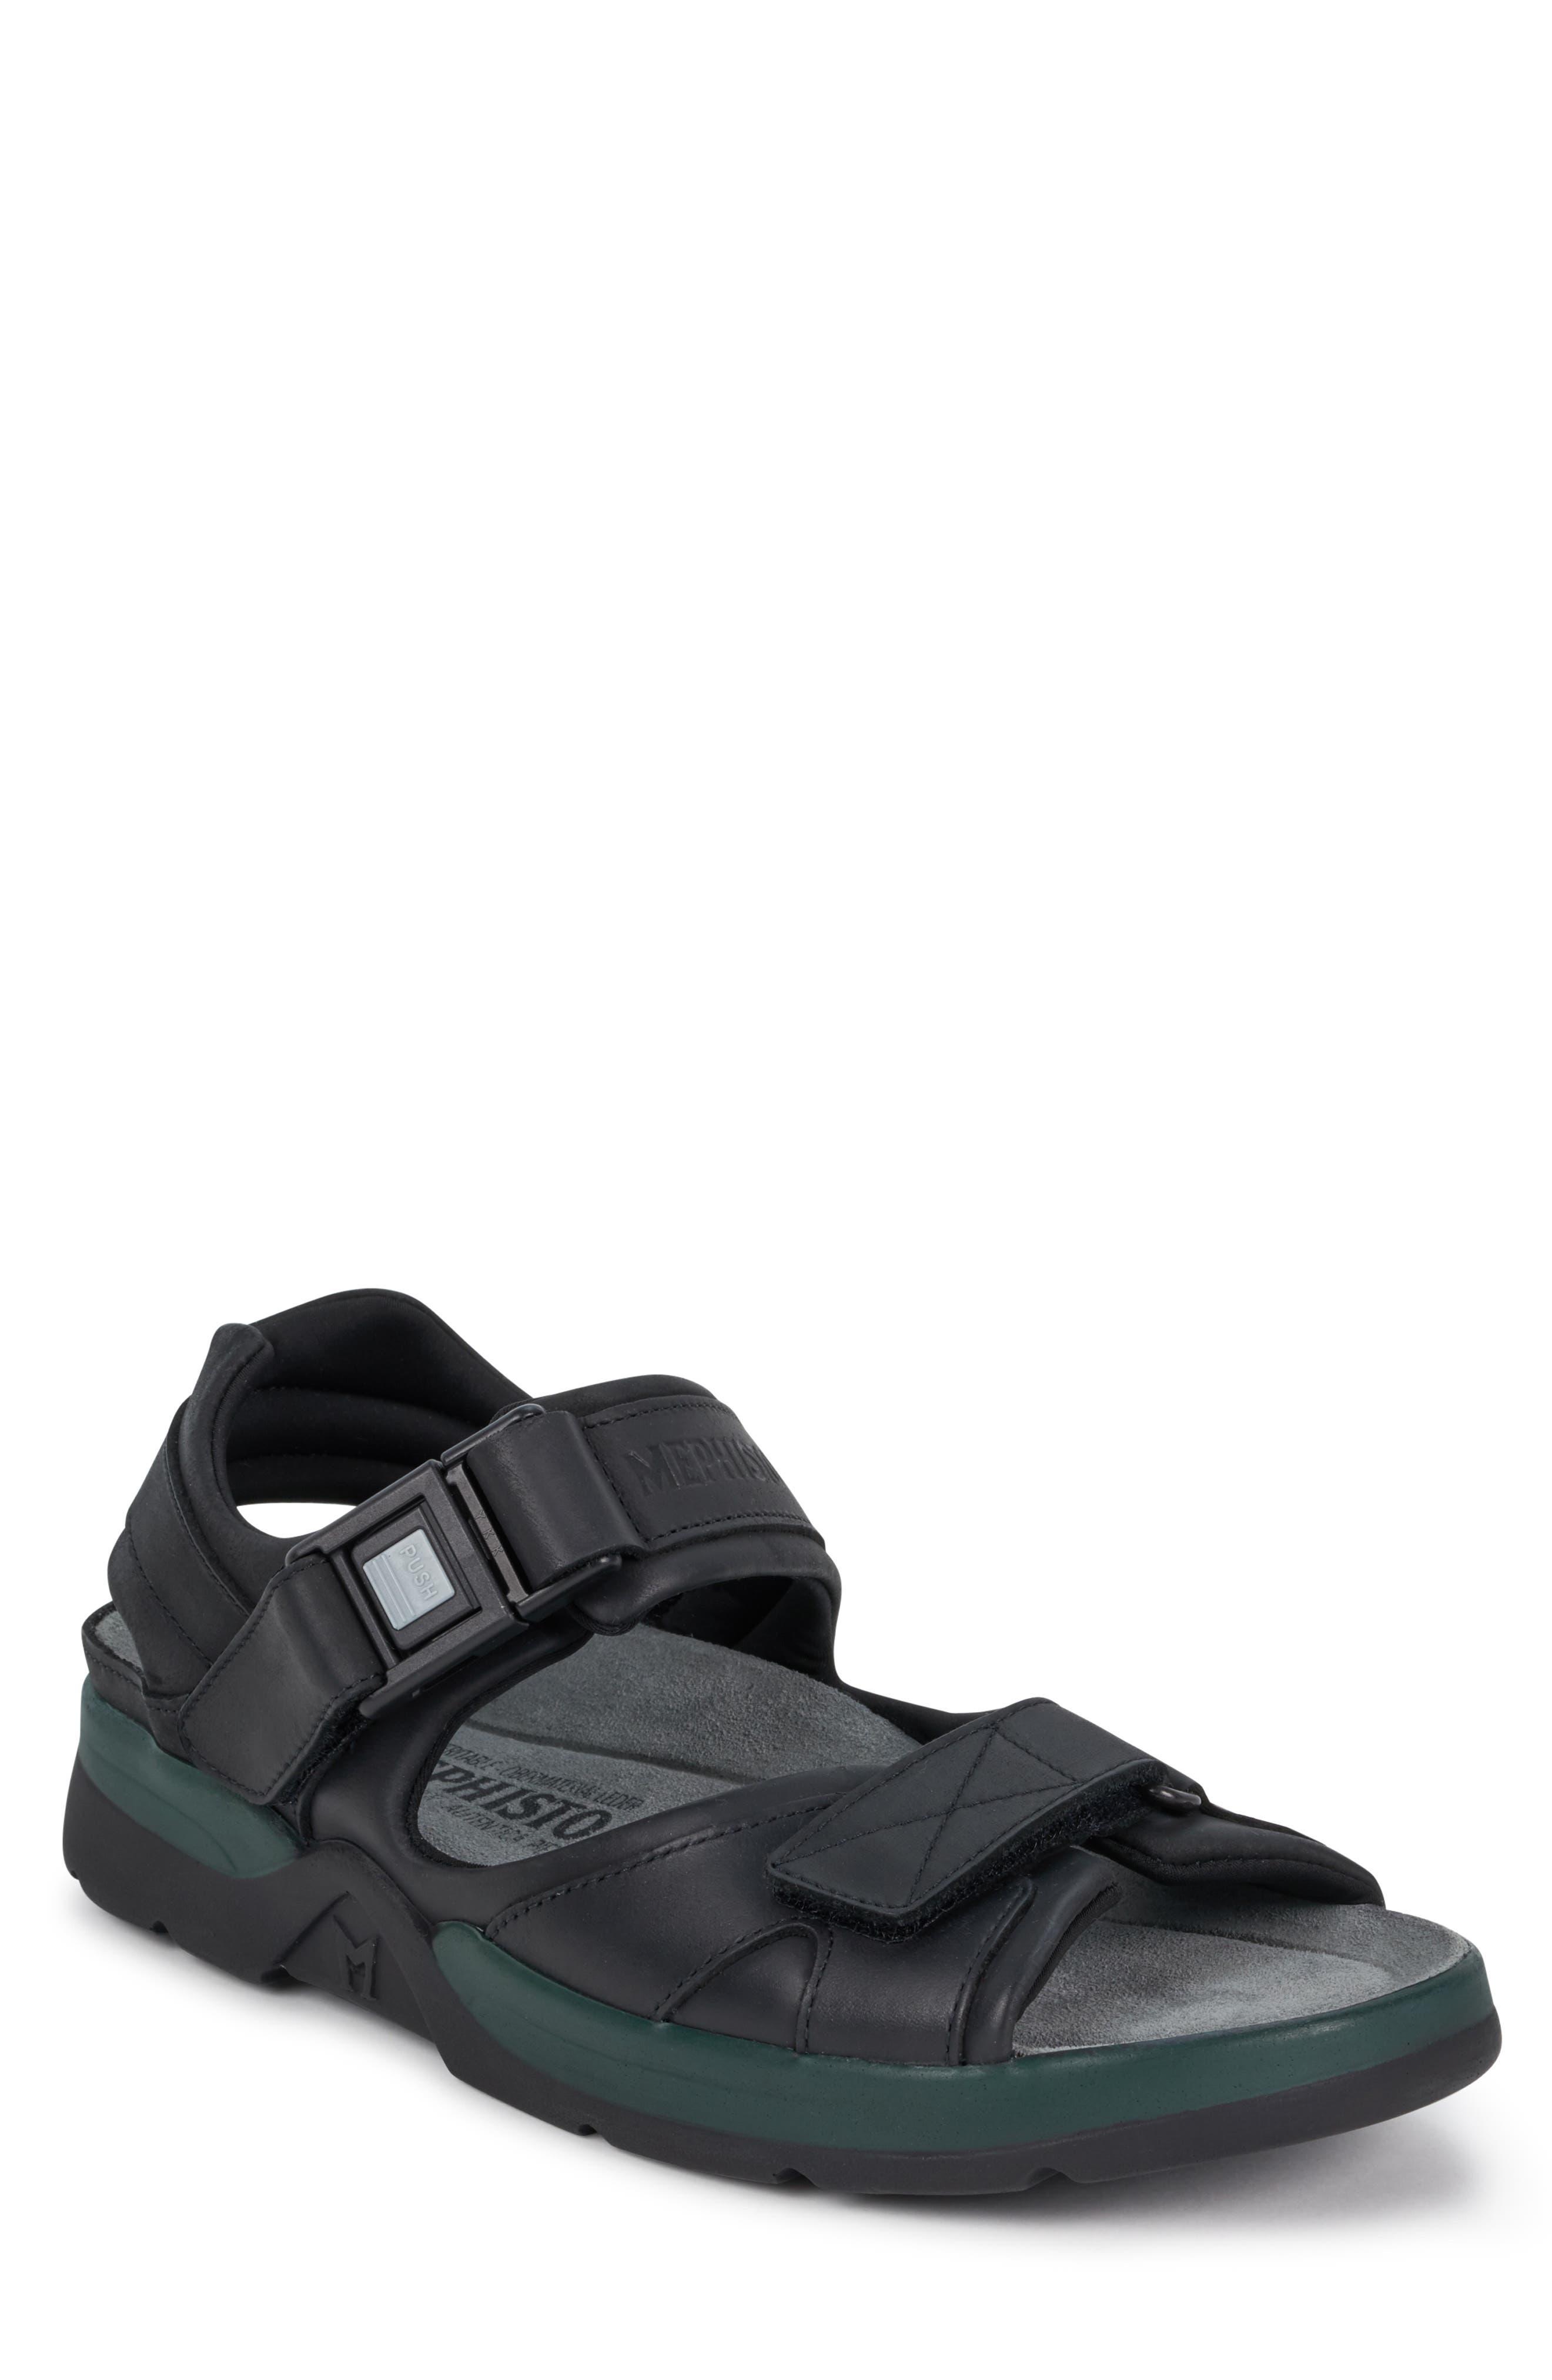 MEPHISTO 'Shark' Sandal, Main, color, BLACK WAXED LEATHER